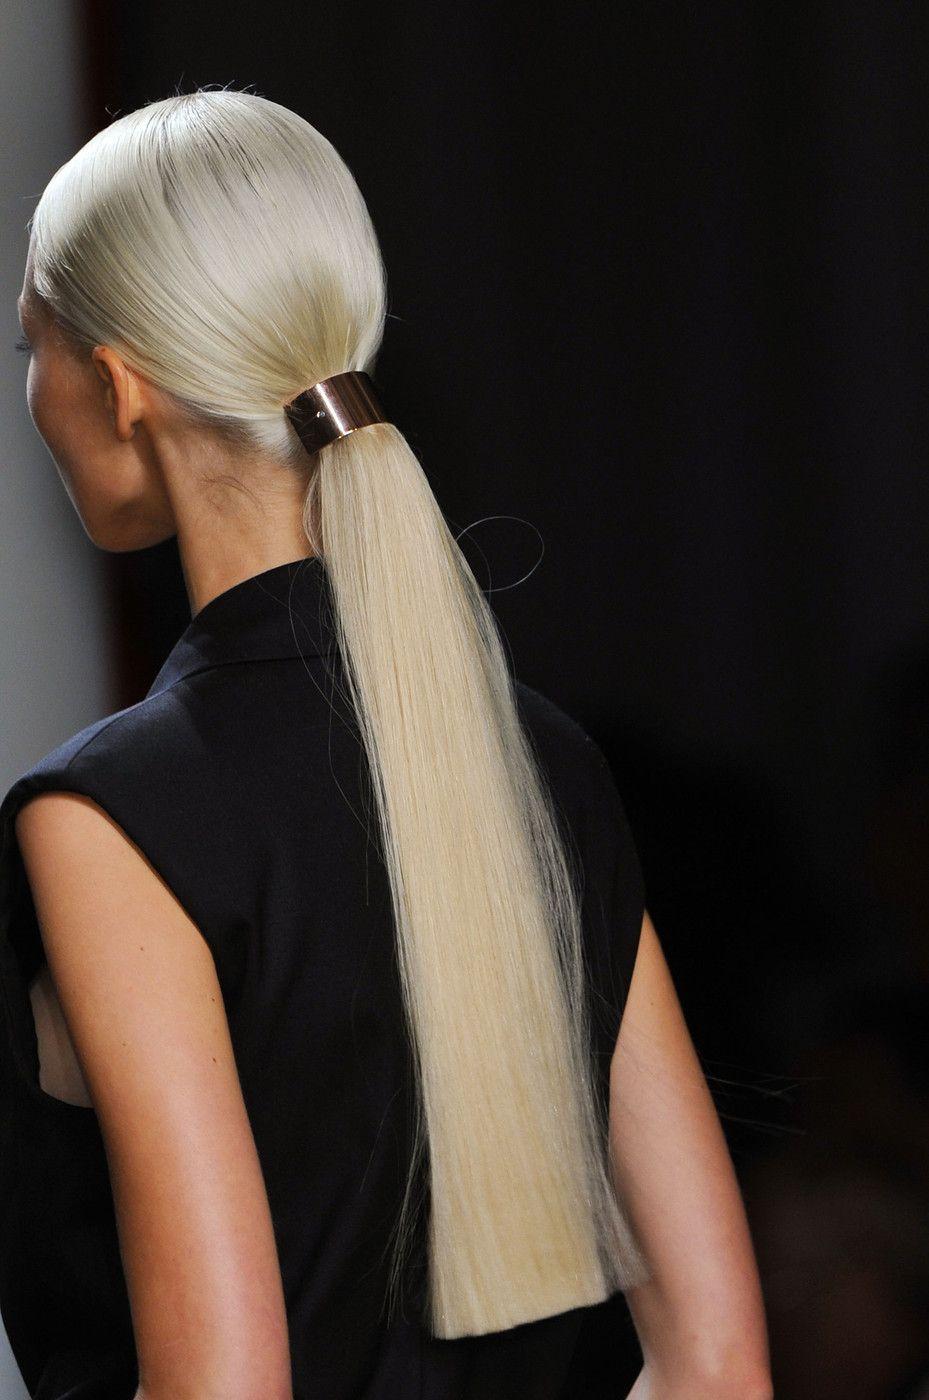 Runway hair for Jason Wu Spring/Summer 2014 RTW at New York Fashion Week.